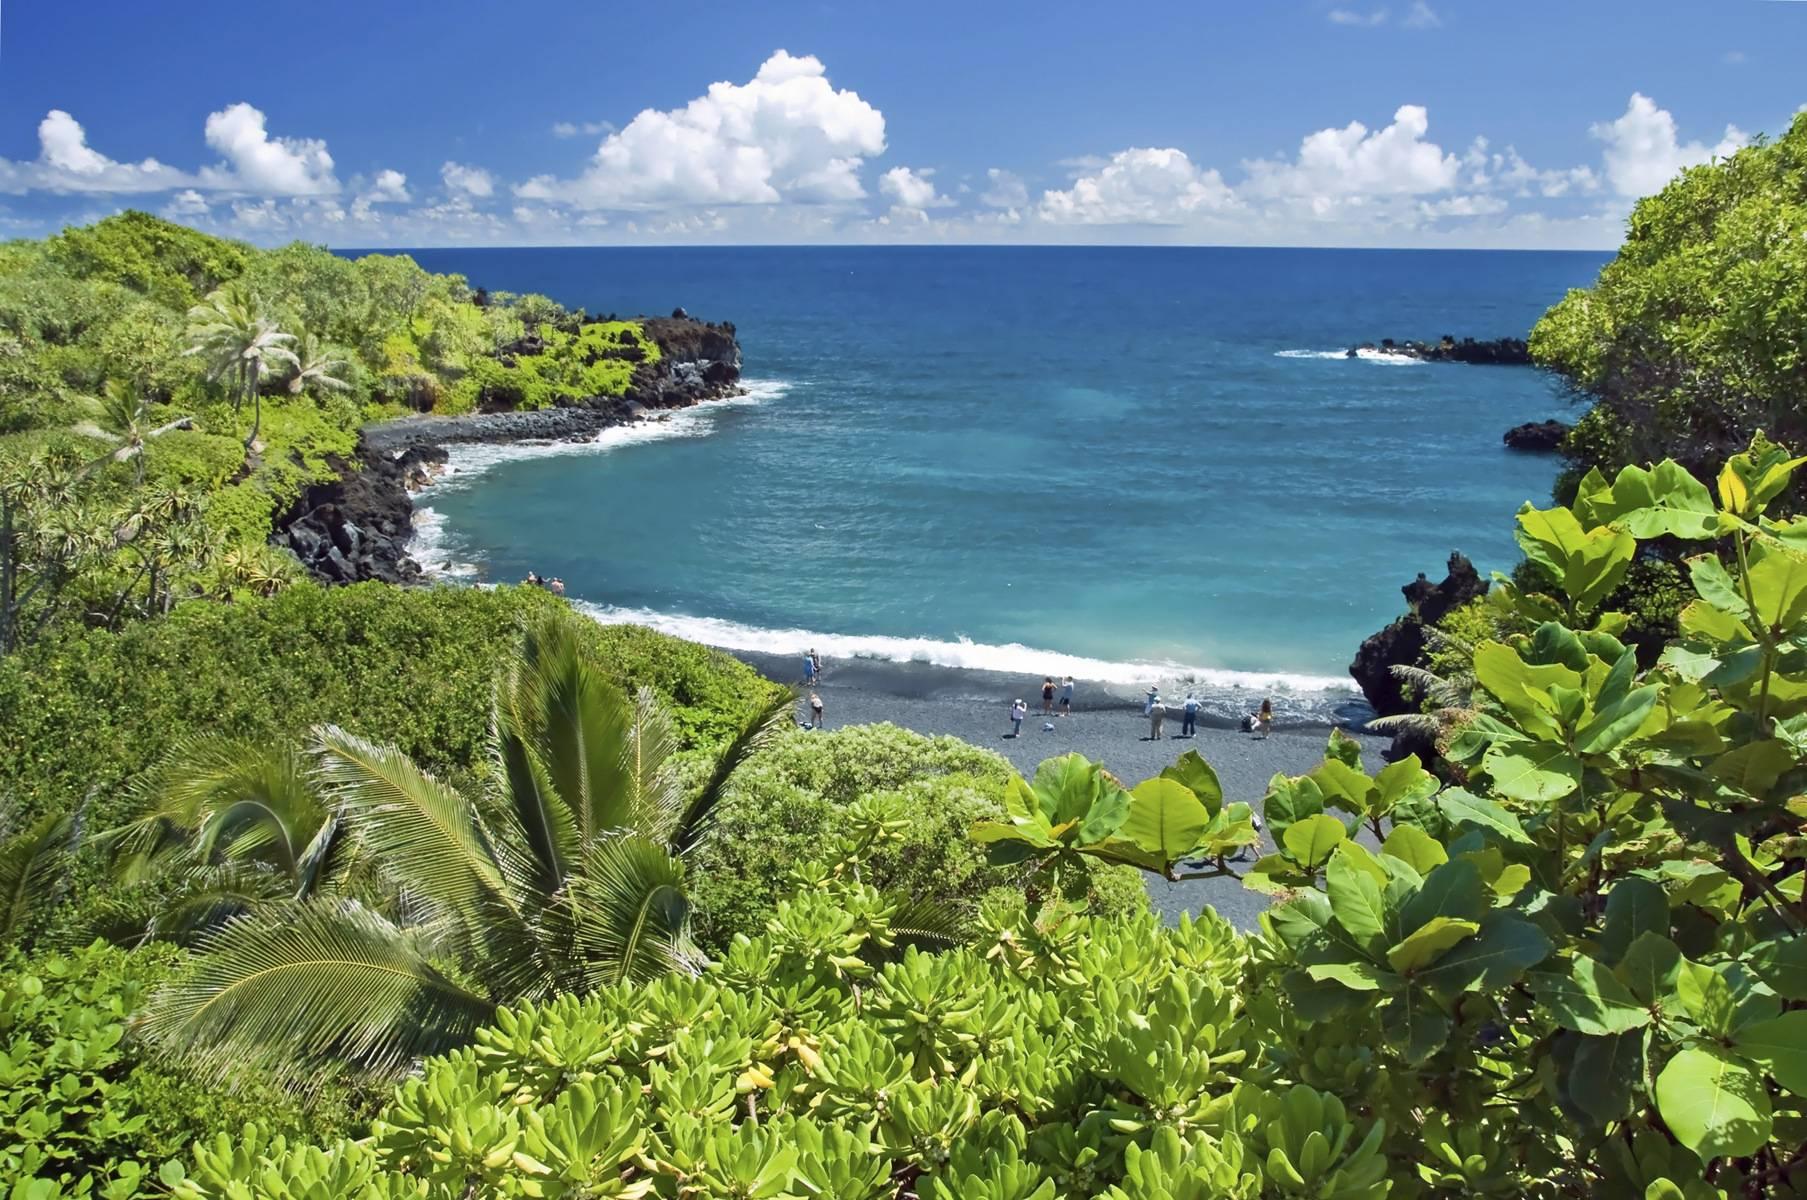 Deluxe Gold Maui Tour of Hana Adventure